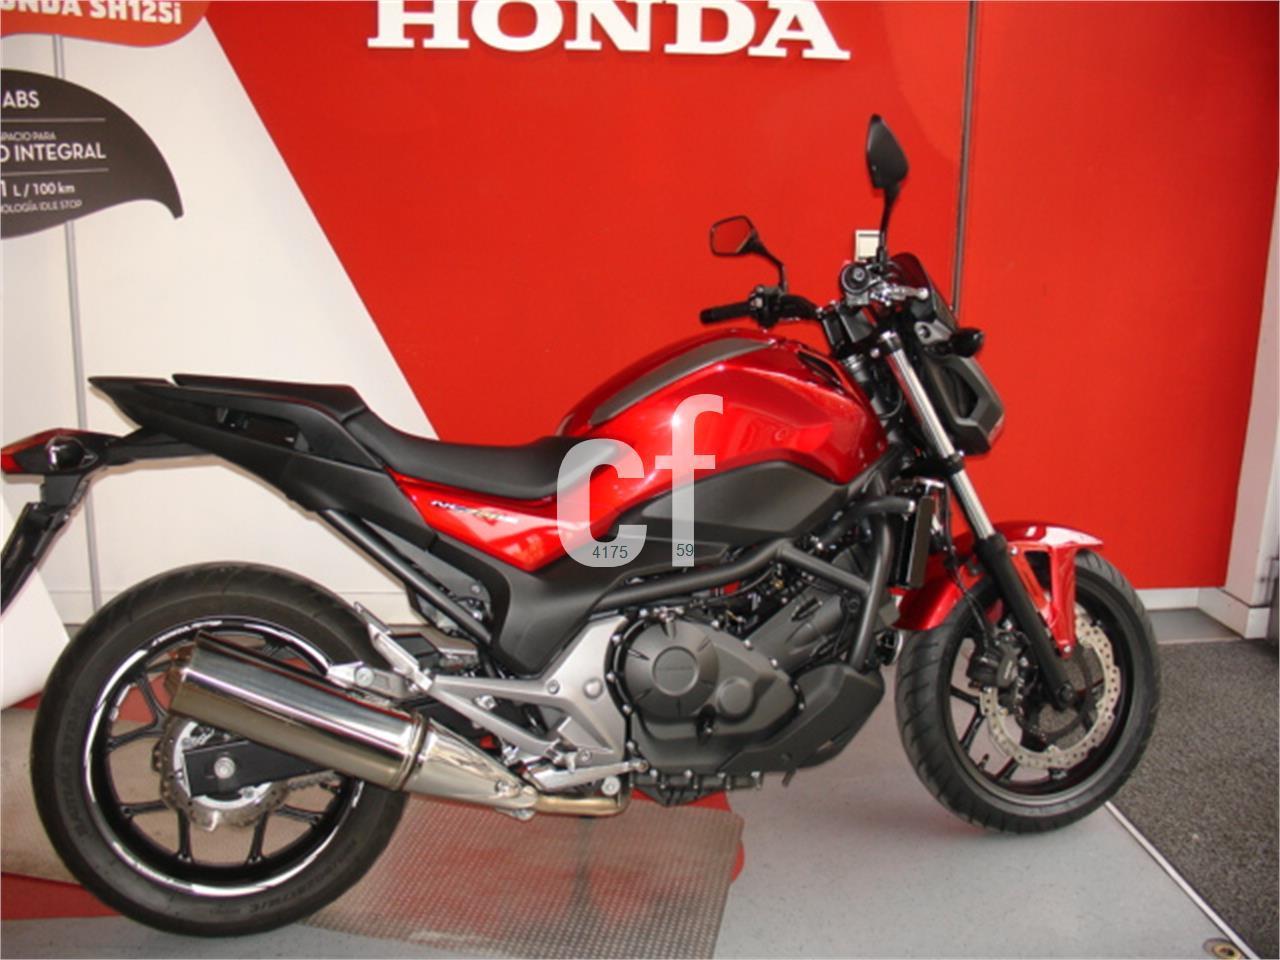 HONDA NC 700 S ABS de venta